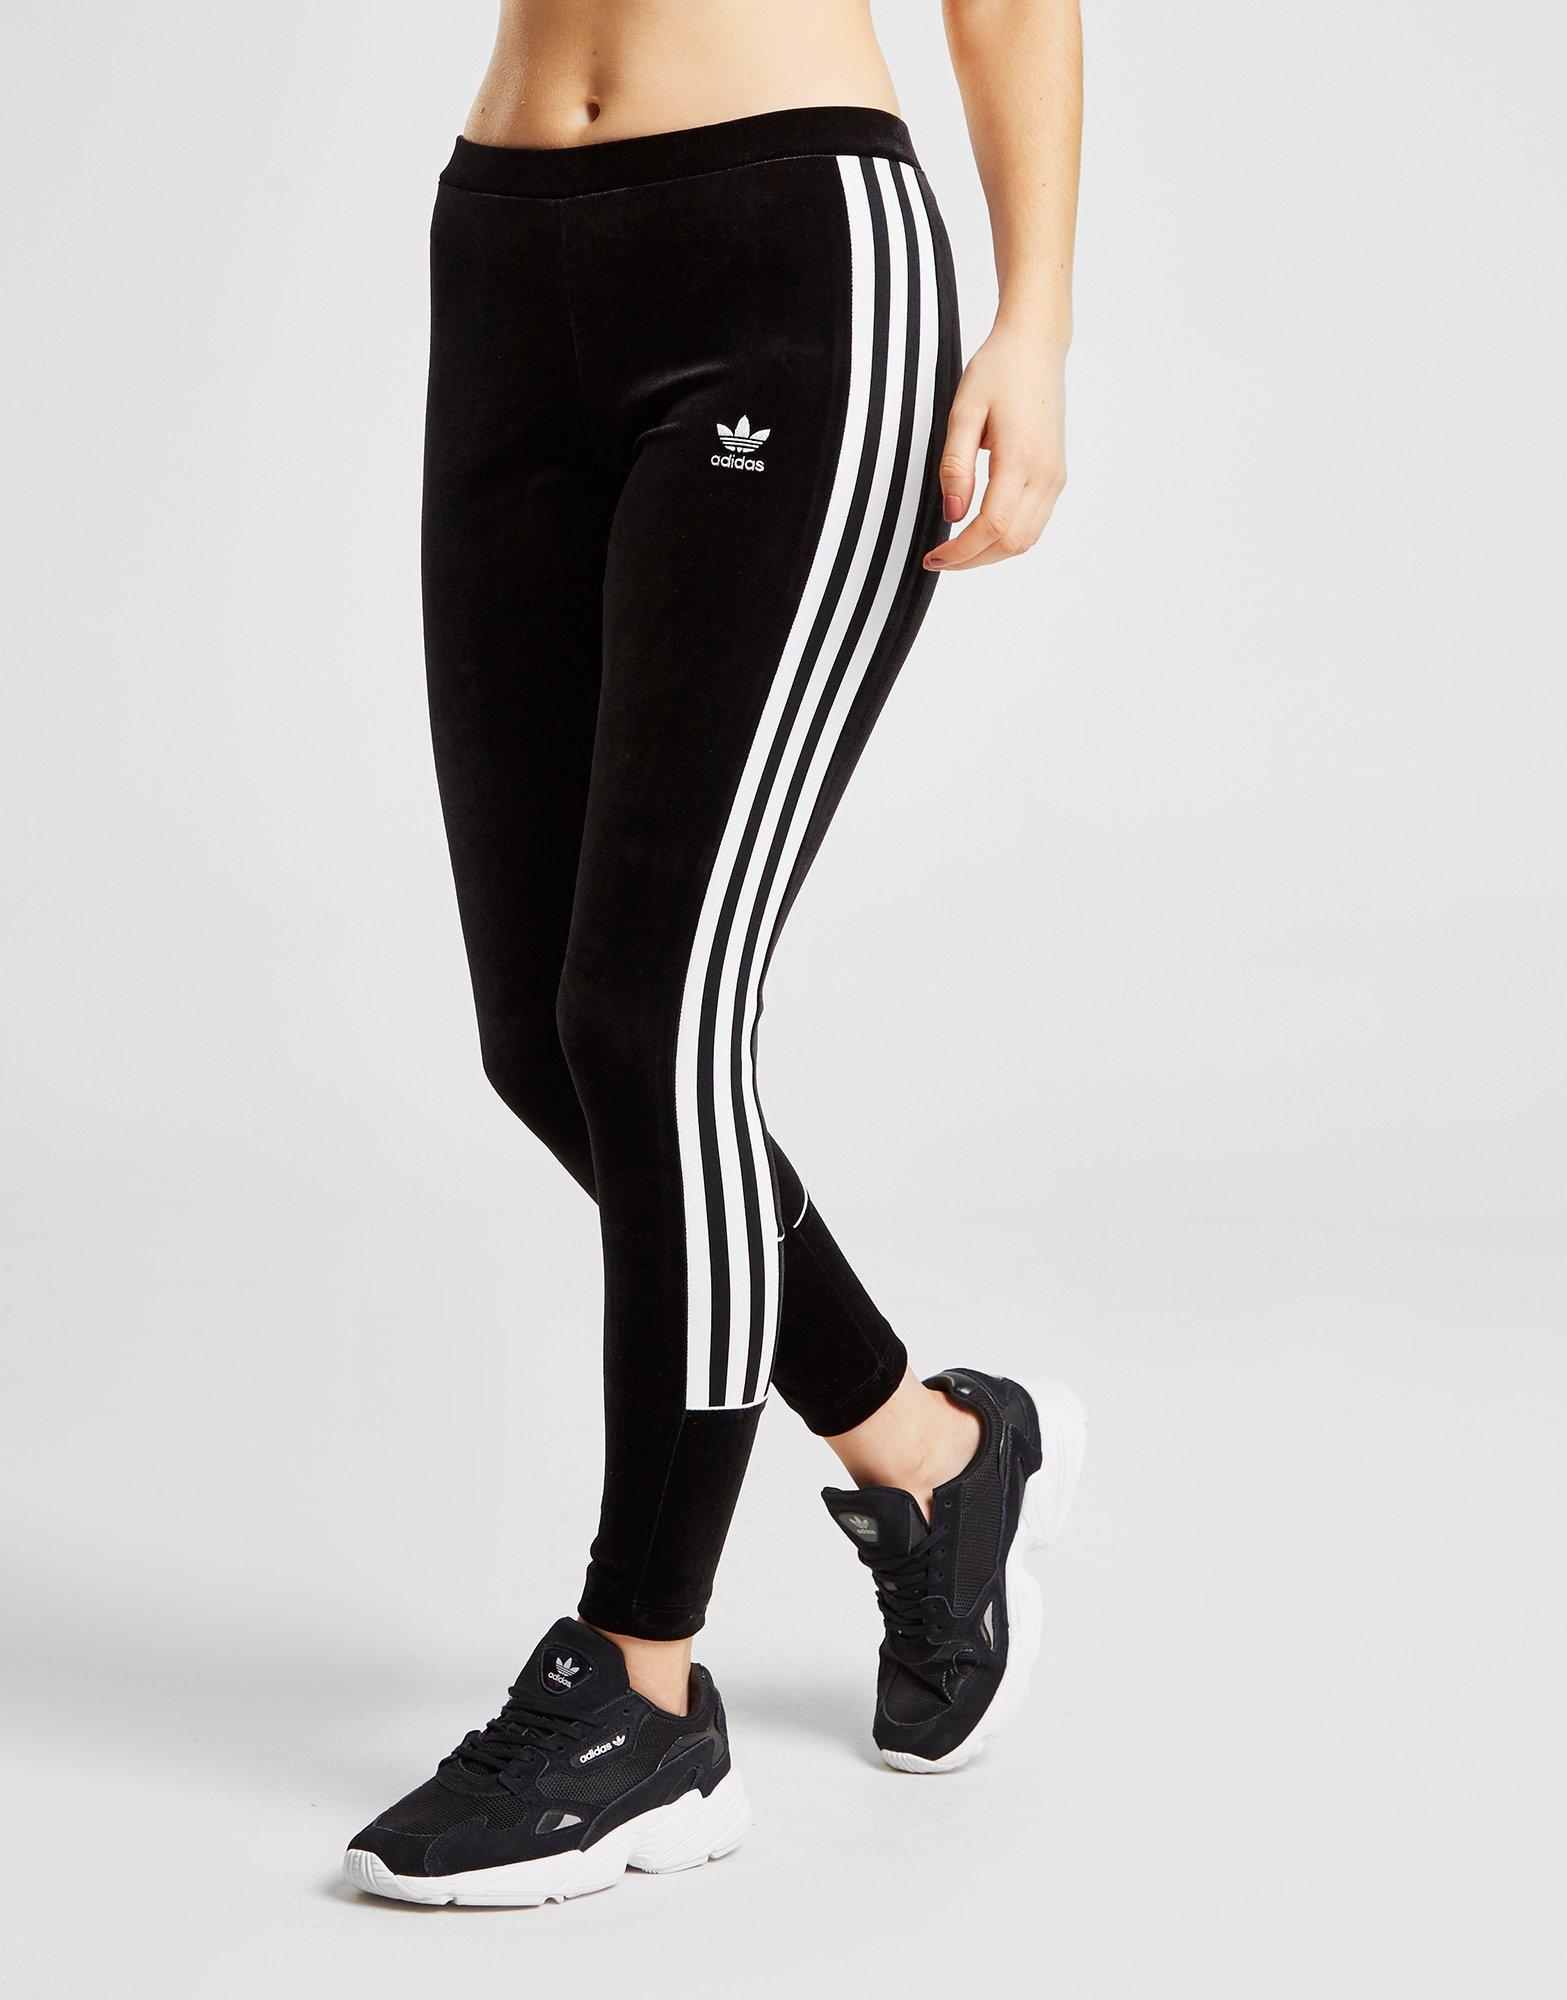 Cher Adidas Stripes Leggings Originals Trefoil Pas Www 3 Velvet wnAxPq0a1n